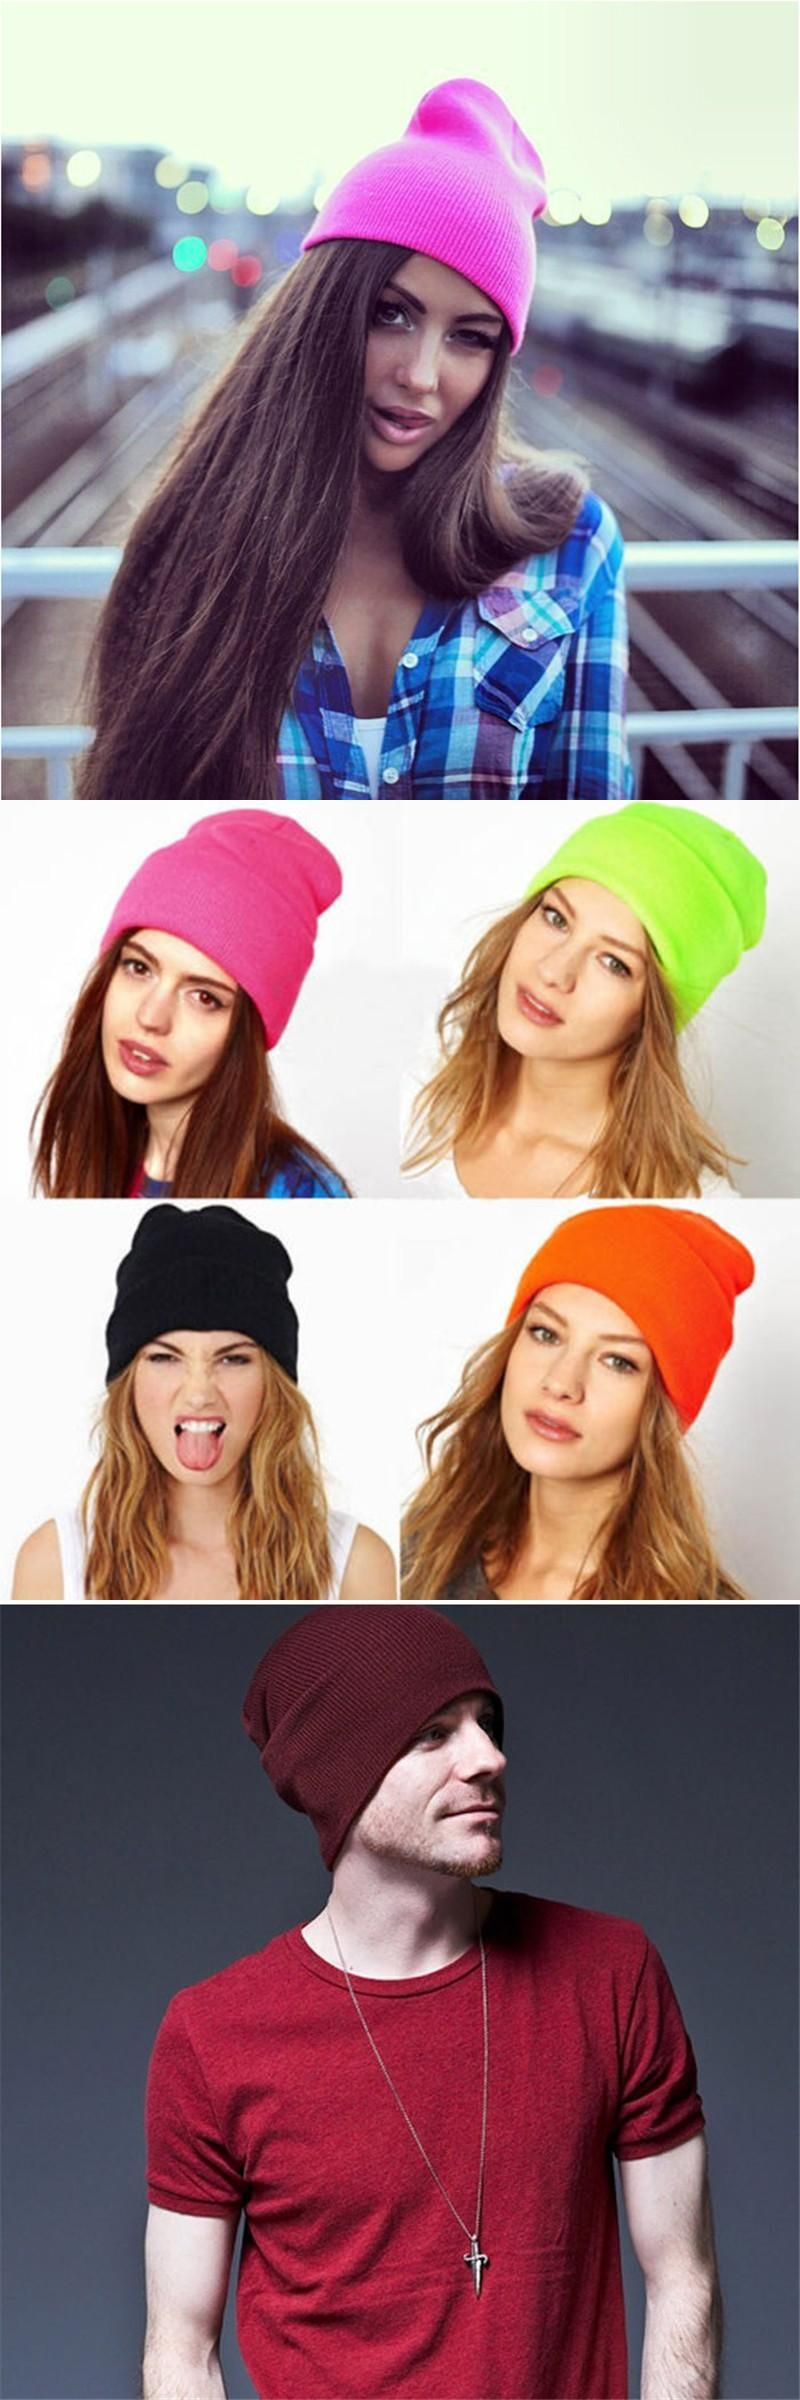 cef68824ec0 New Fashion Knitted Neon Hip-hop Hat Beanies Women Beanie Girls Autumn  Casual Cap Men